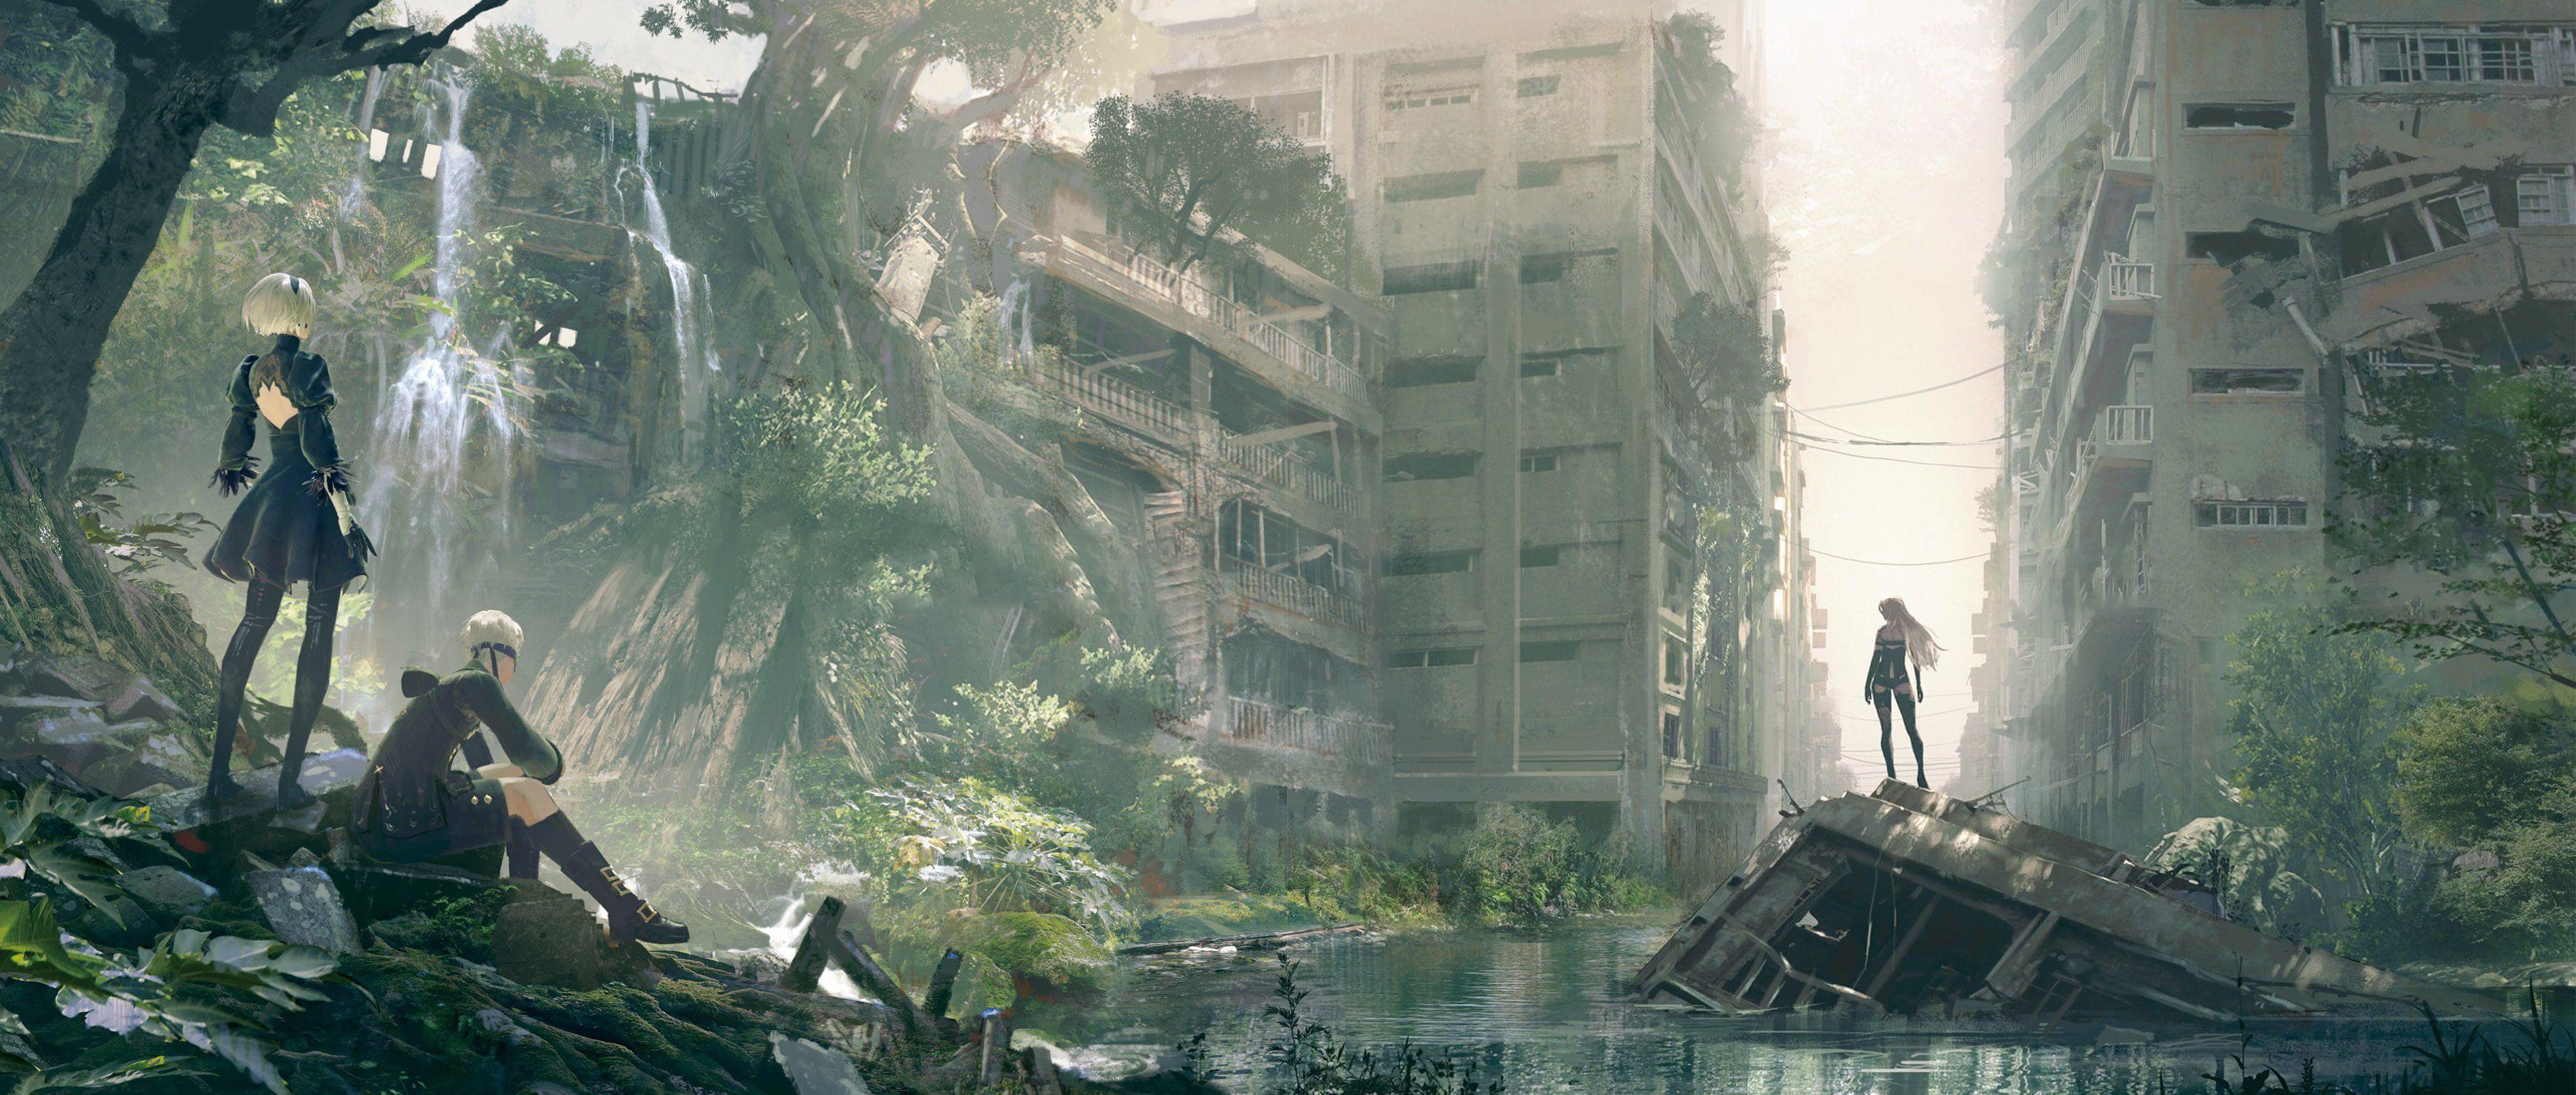 Nier Automata 2b 9s A2 Anime Video Games Ruin Cityscape Apocalyptic 2k Wallpaper Hdwallpaper Desktop In 2020 Nier Automata Automata Cityscape Wallpaper